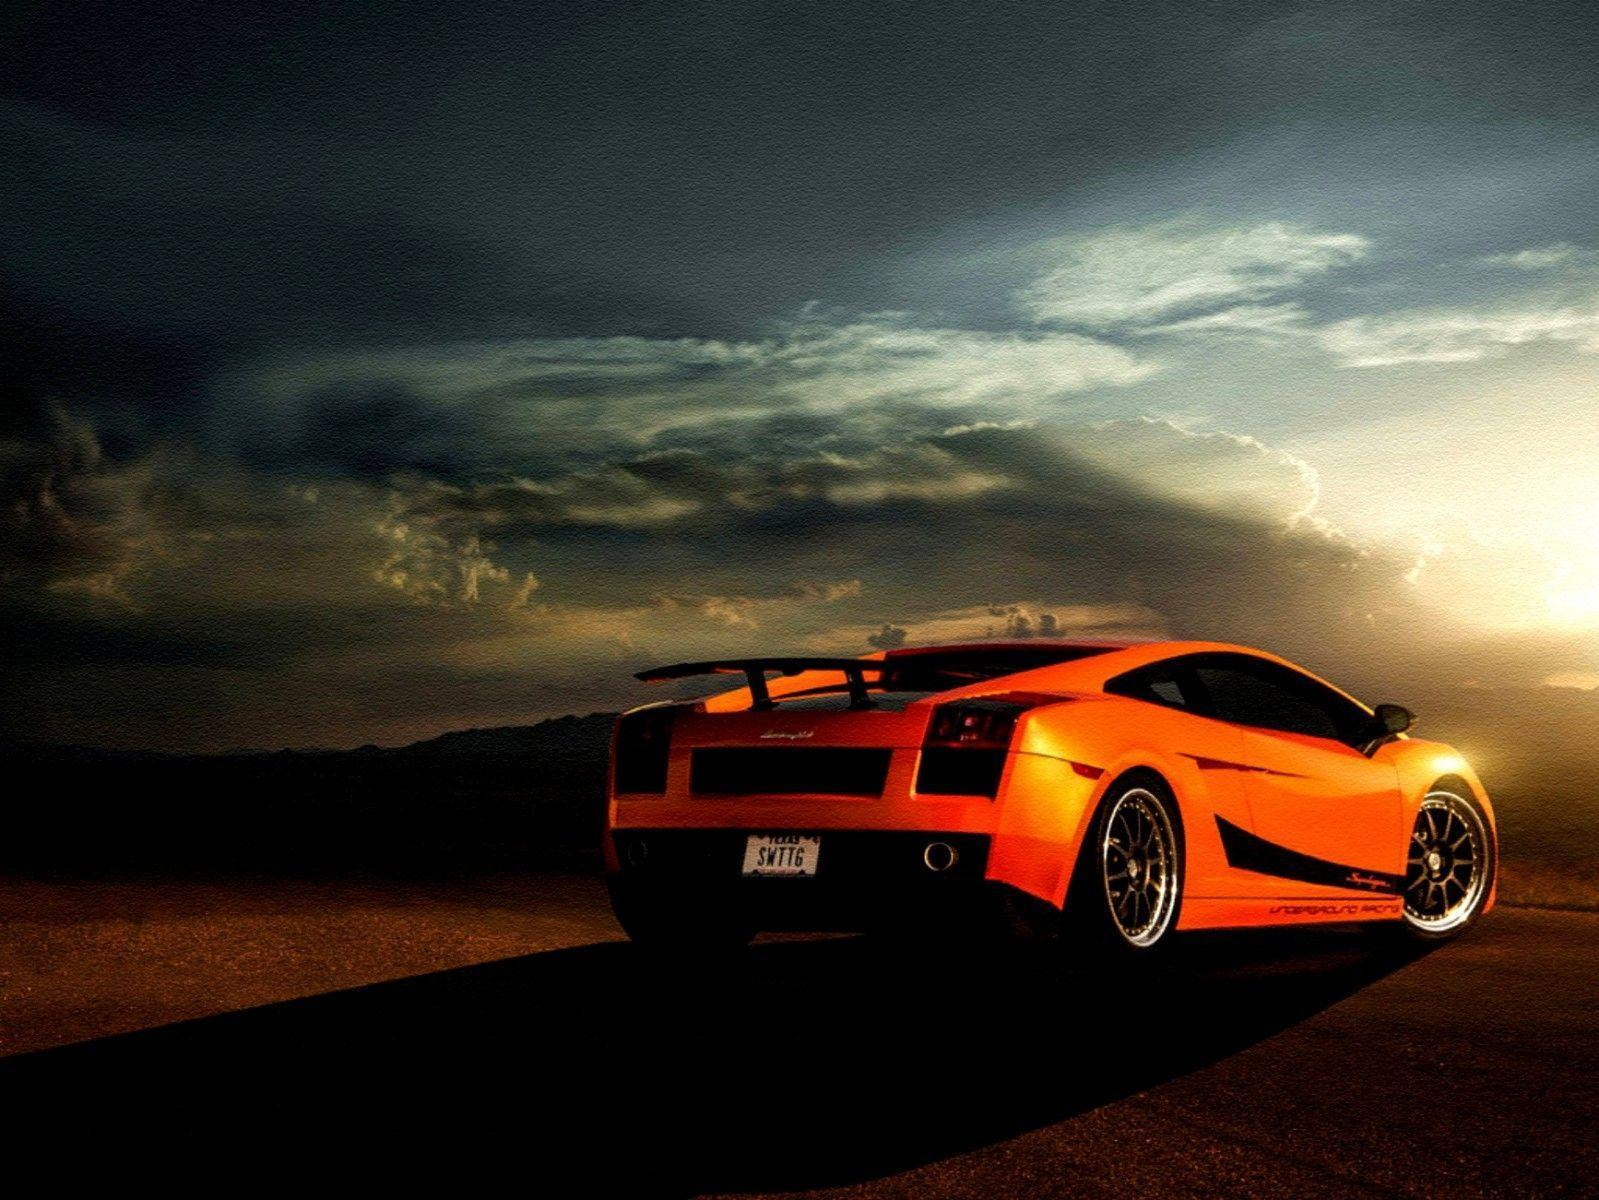 Lamborghini Gallardo Wallpapers - Wallpaper Cave